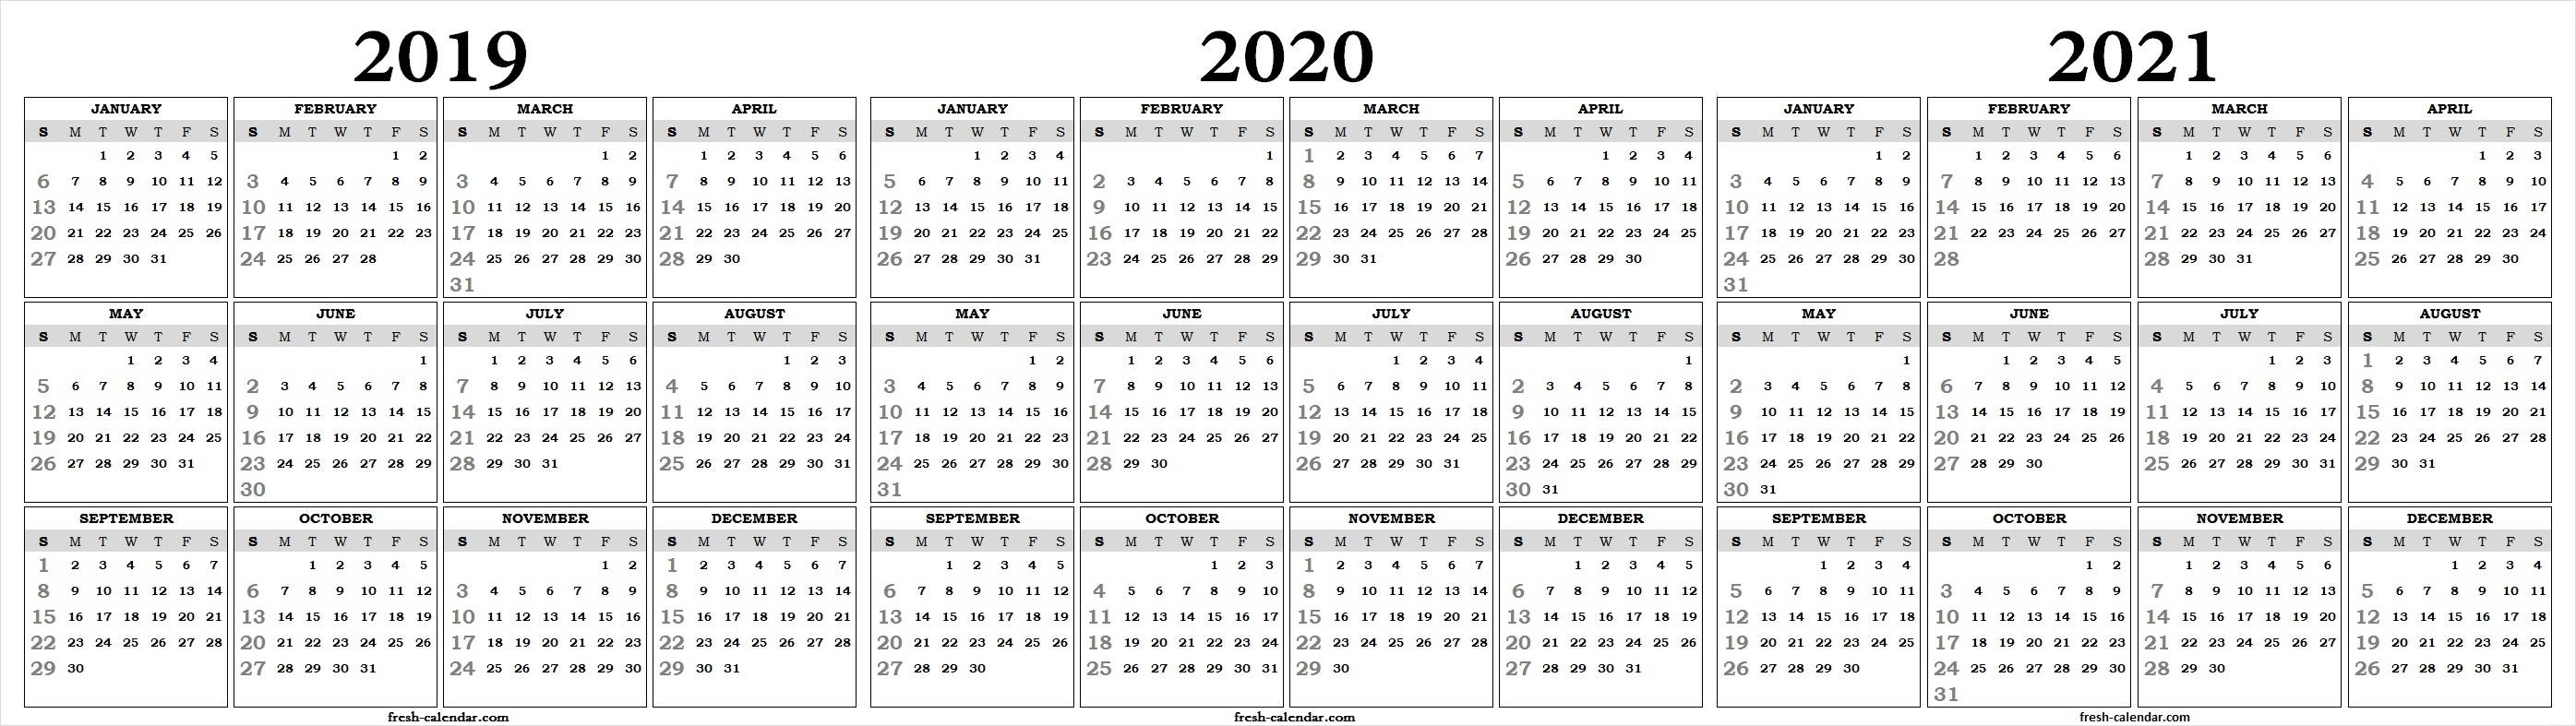 Fine 3 Year Calendar 2019 To 2021 : Mini Calendar Template with 3 Year Calendar Printable 2019 2020 2021